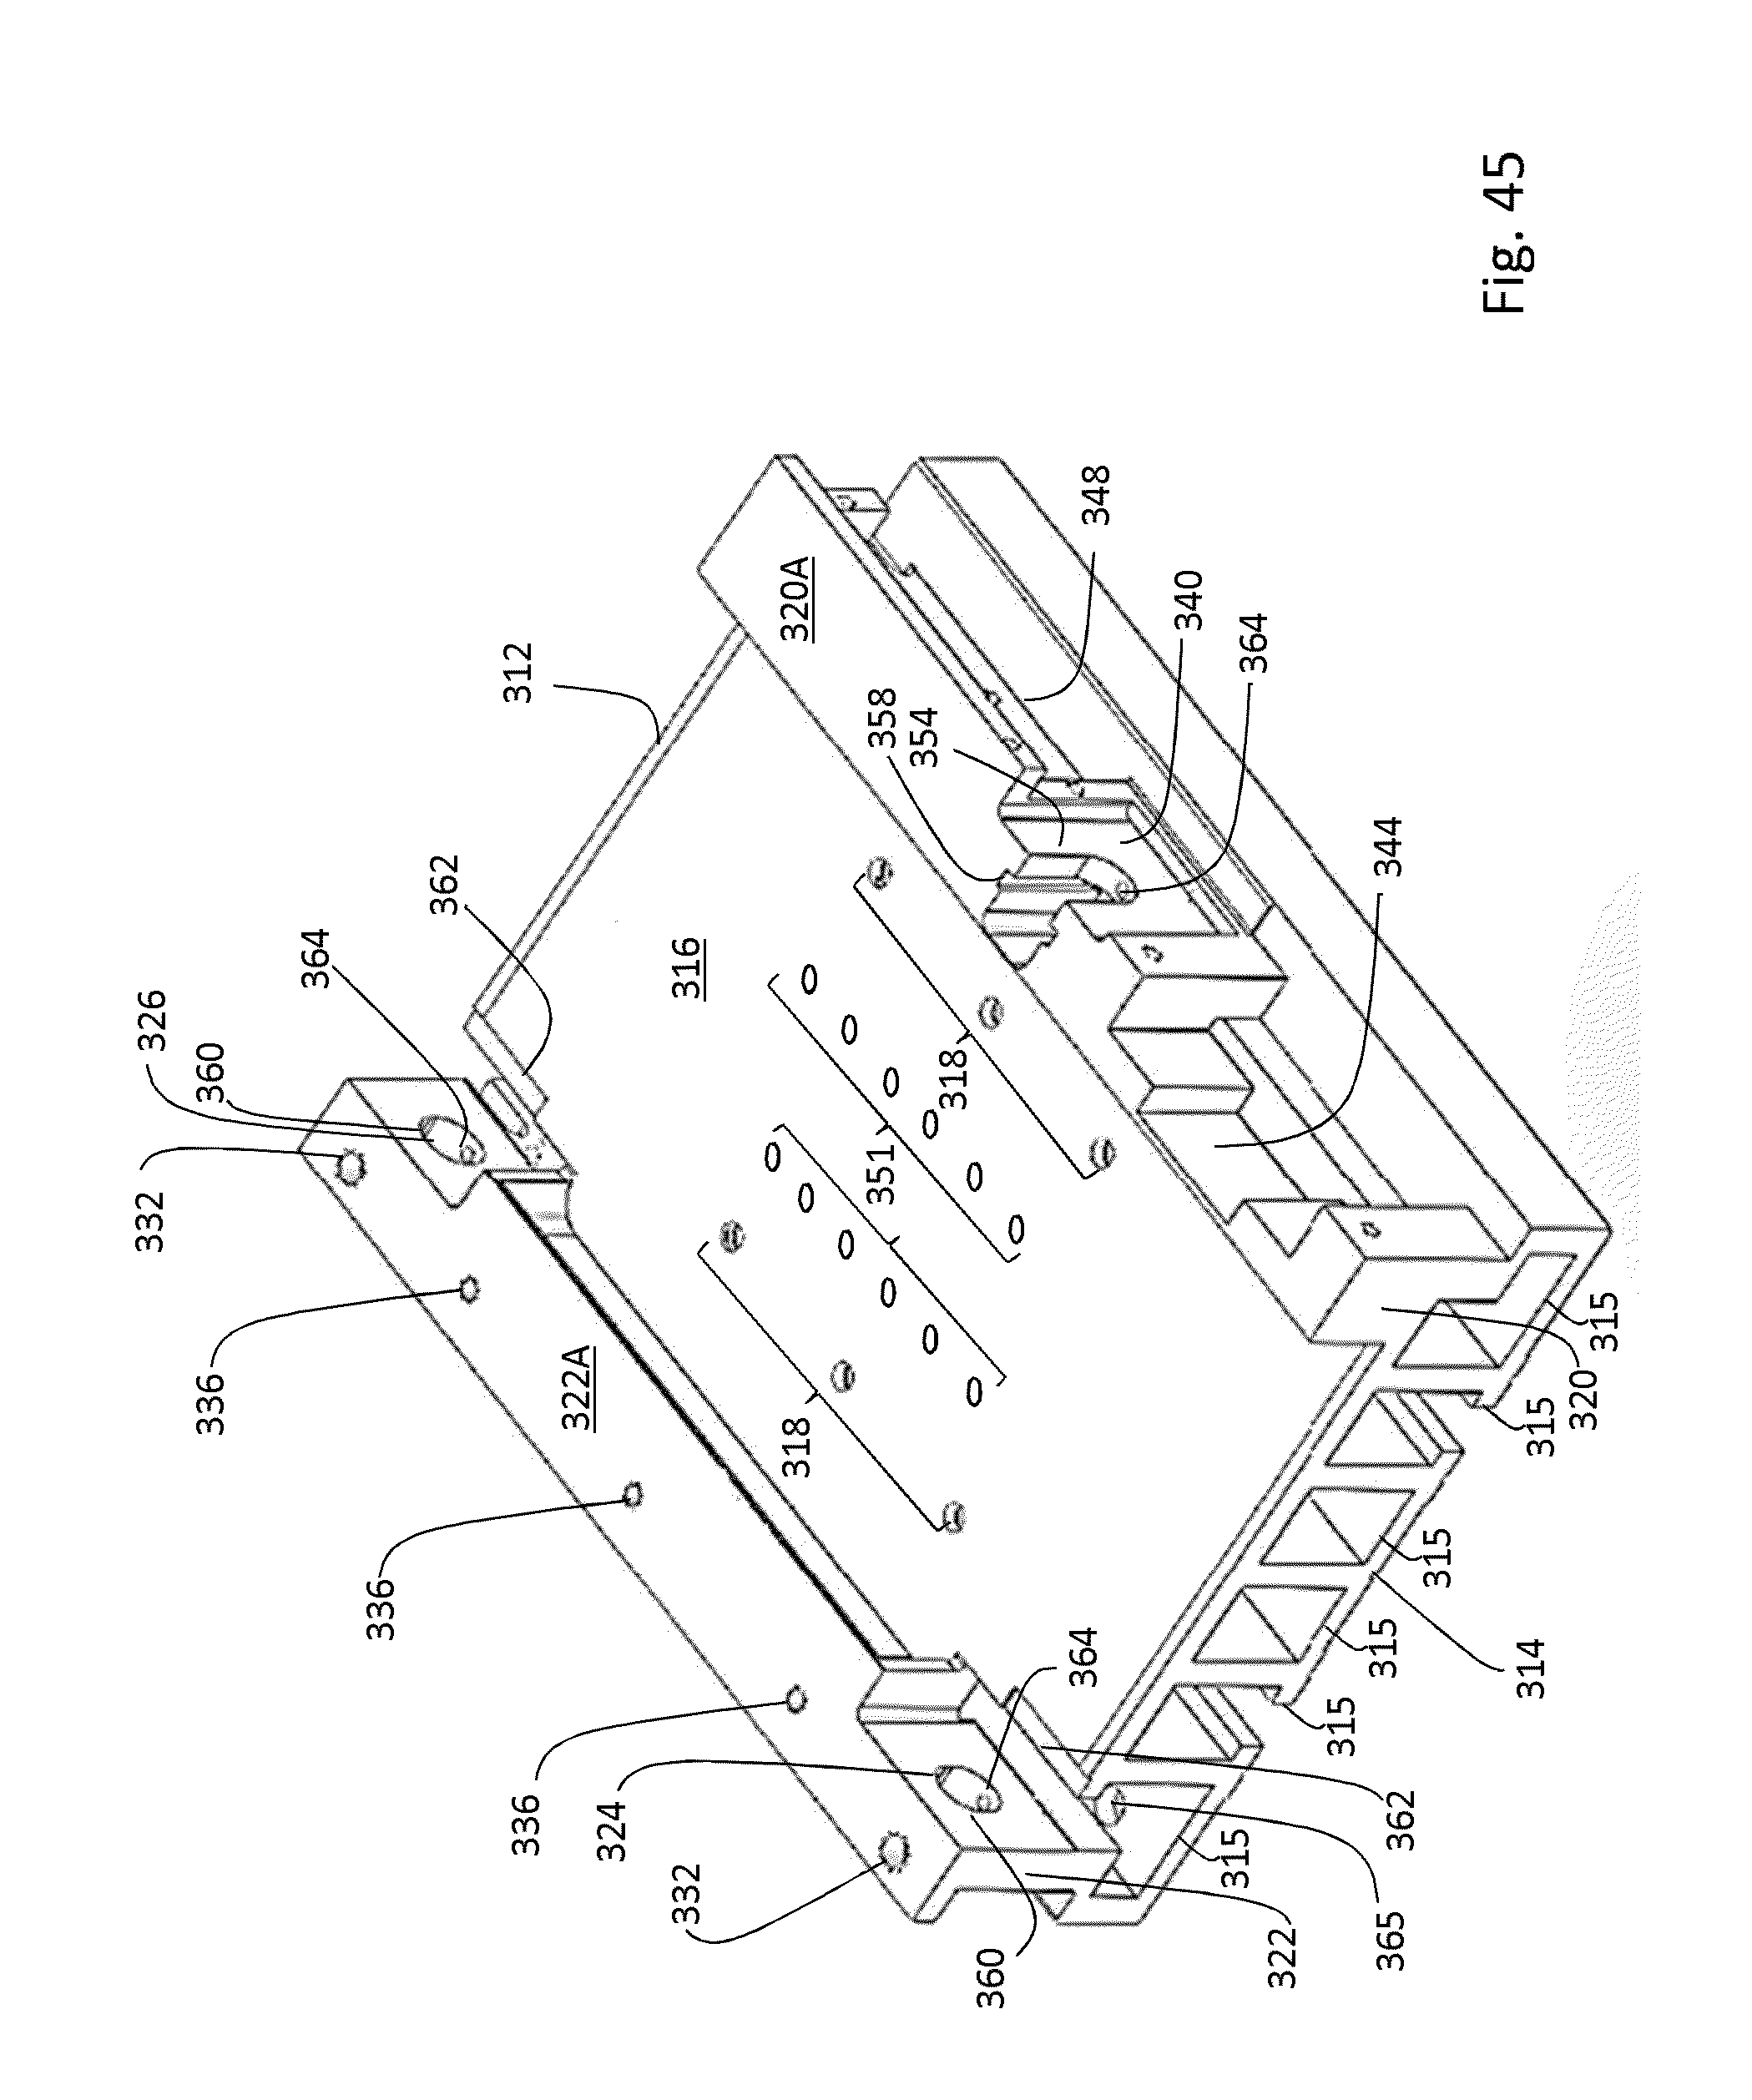 115 volt motor start capacitor wiring diagram